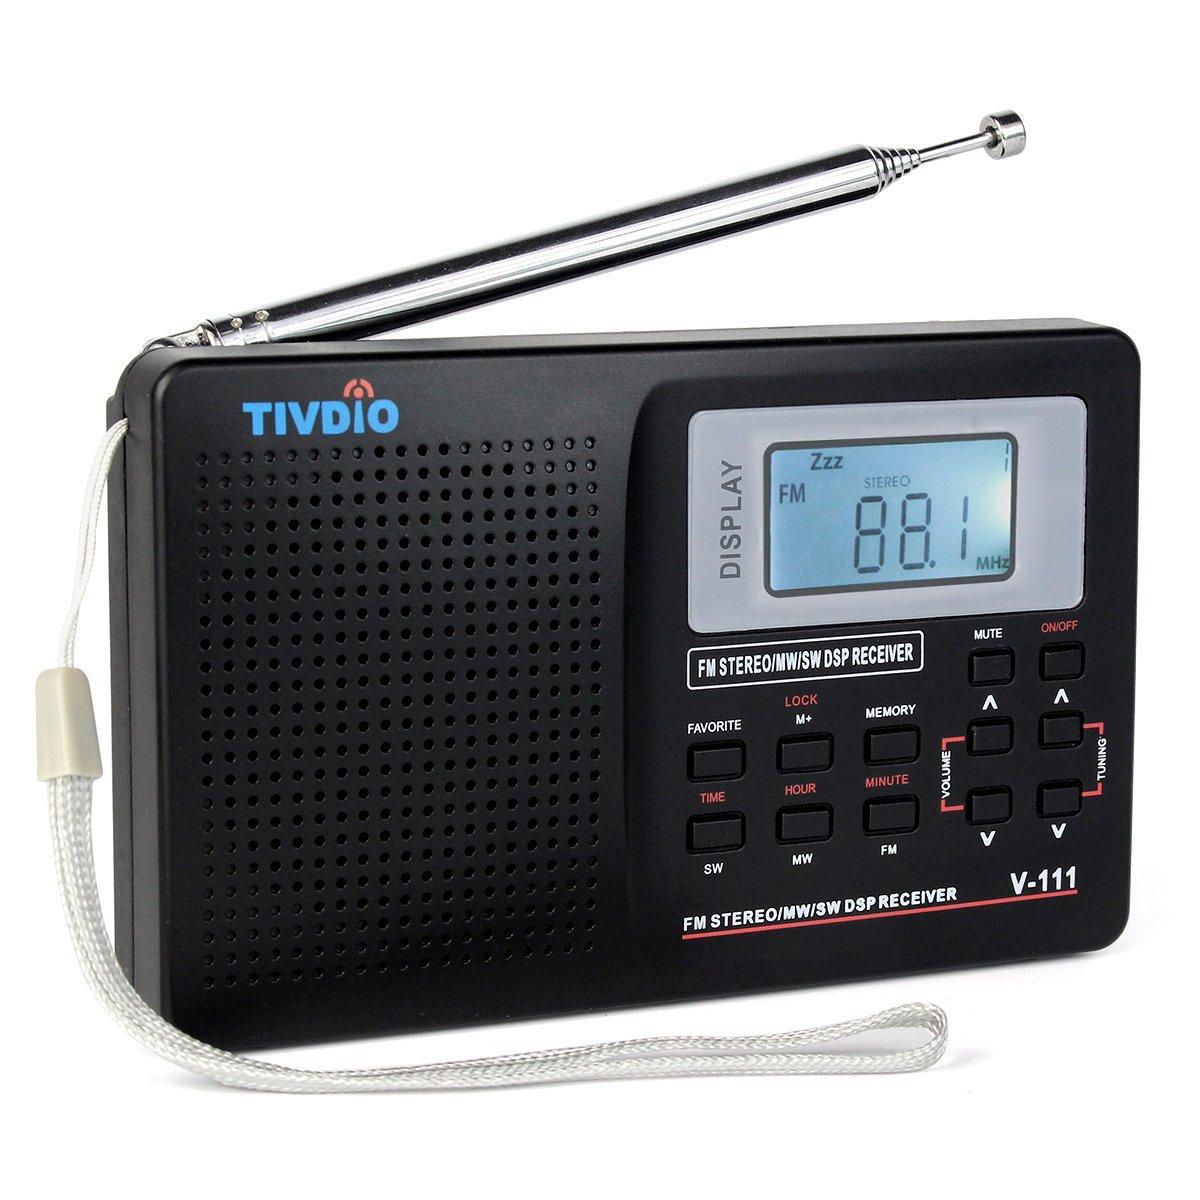 TIVDIO V-111 Portable AM FM Shortwave Radio Alarm Clock Battery Operated AA Battery with Back-light Earphone Jack Sleep Timer for Travel(Black)